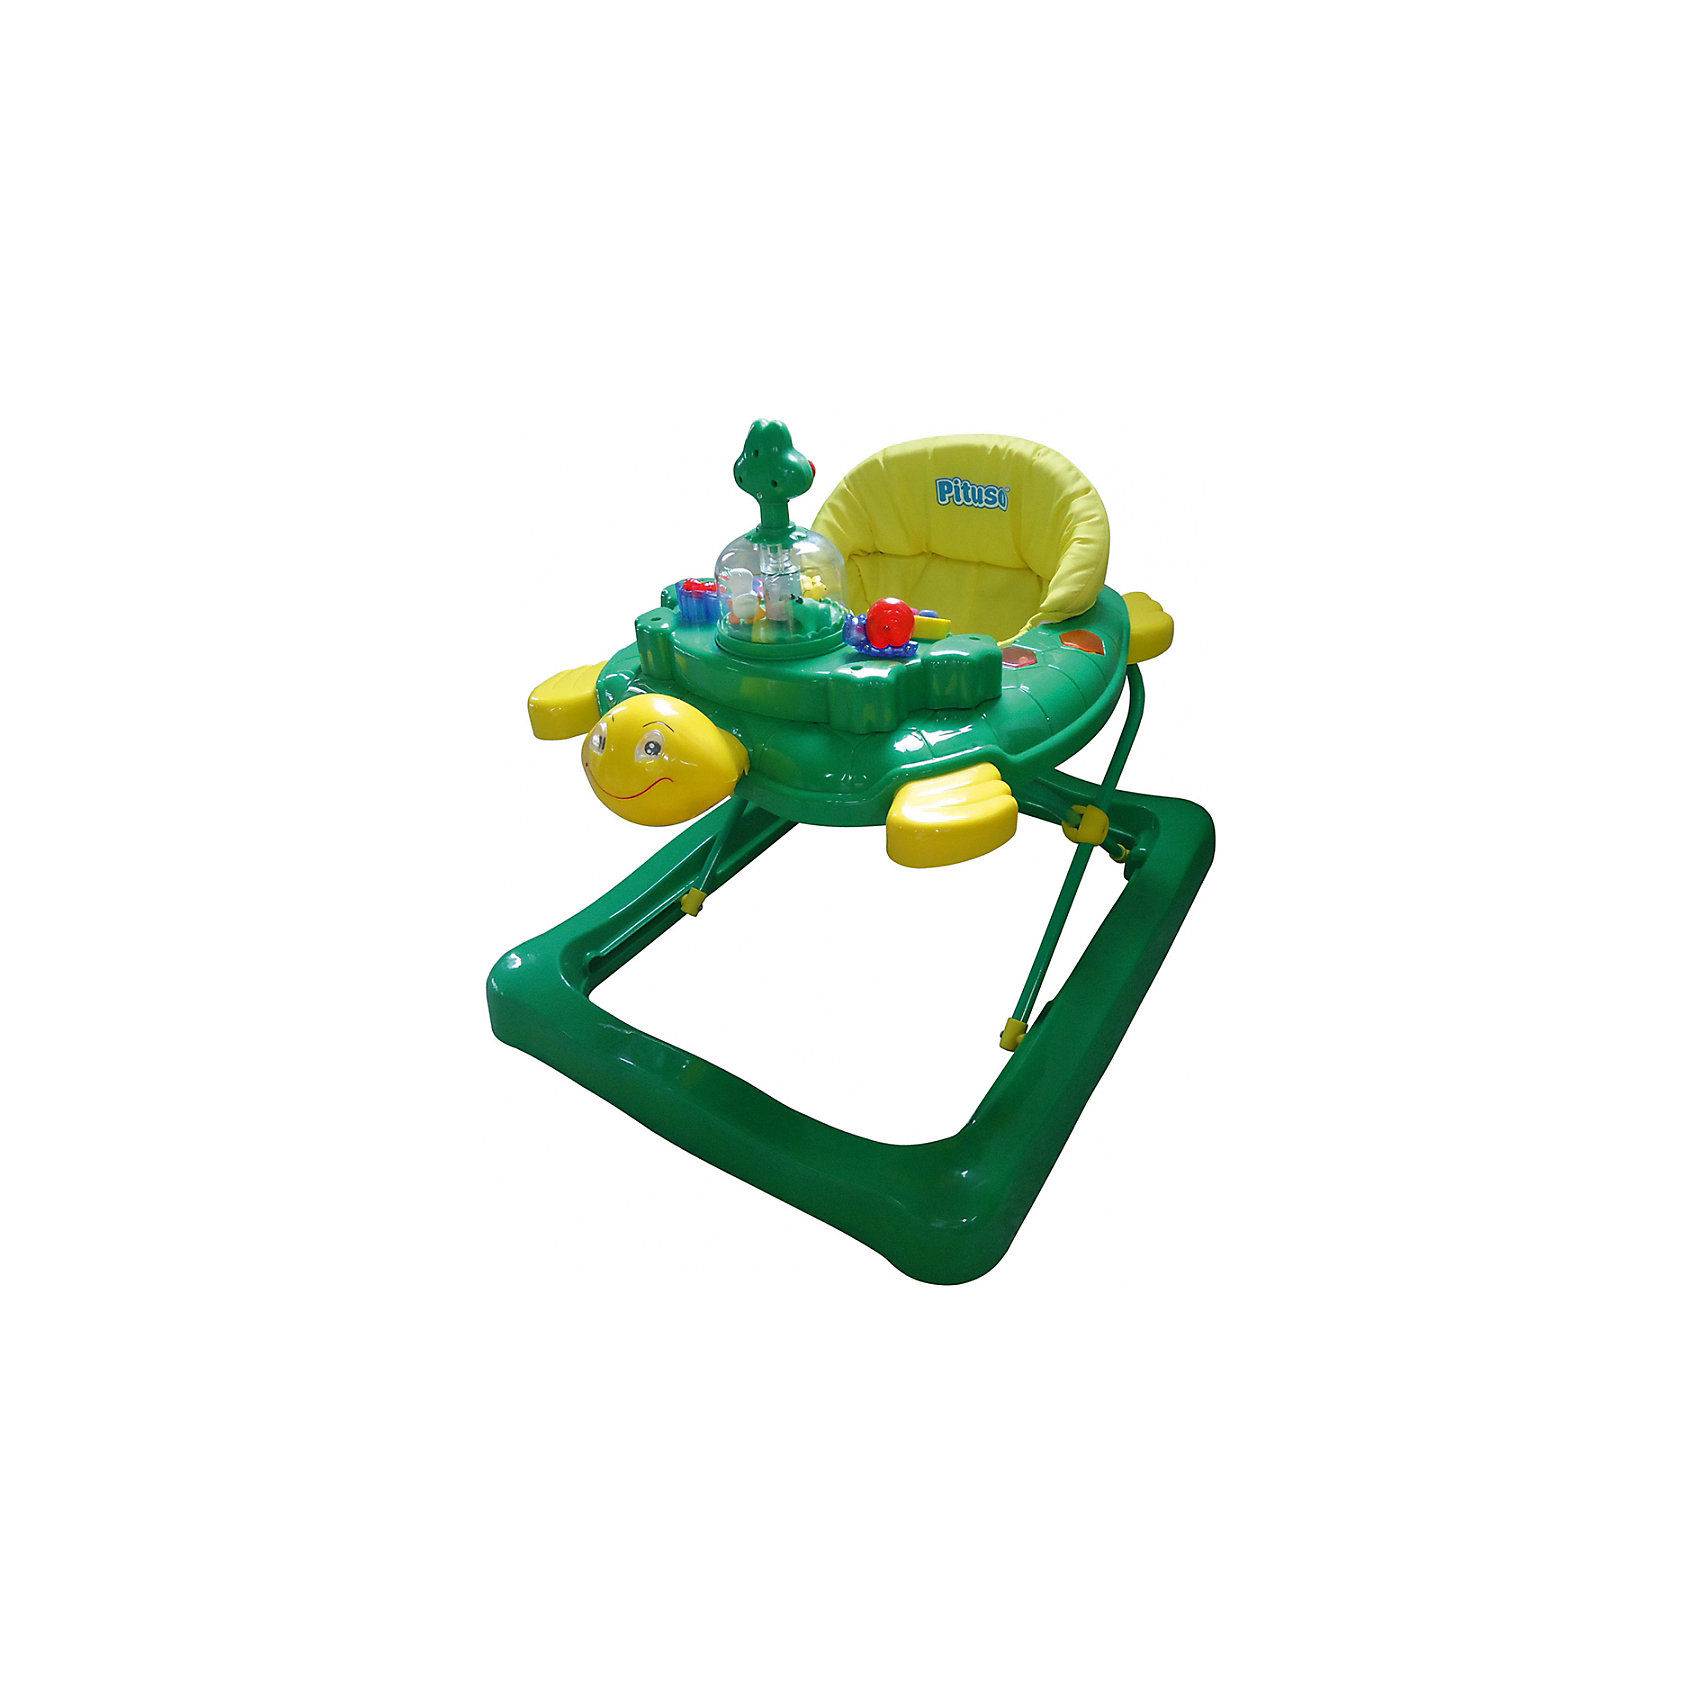 Ходунки Tortuga Черепаха, Pituso, зеленыйХодунки<br>PITUSO Ходунки TORTUGA ЧЕРЕПАХА (4 колес,игрушки,звук) 1 шт в кор., 71*64*55см, Зеленый<br><br>Ширина мм: 640<br>Глубина мм: 550<br>Высота мм: 710<br>Вес г: 5900<br>Возраст от месяцев: 6<br>Возраст до месяцев: 12<br>Пол: Унисекс<br>Возраст: Детский<br>SKU: 5559206